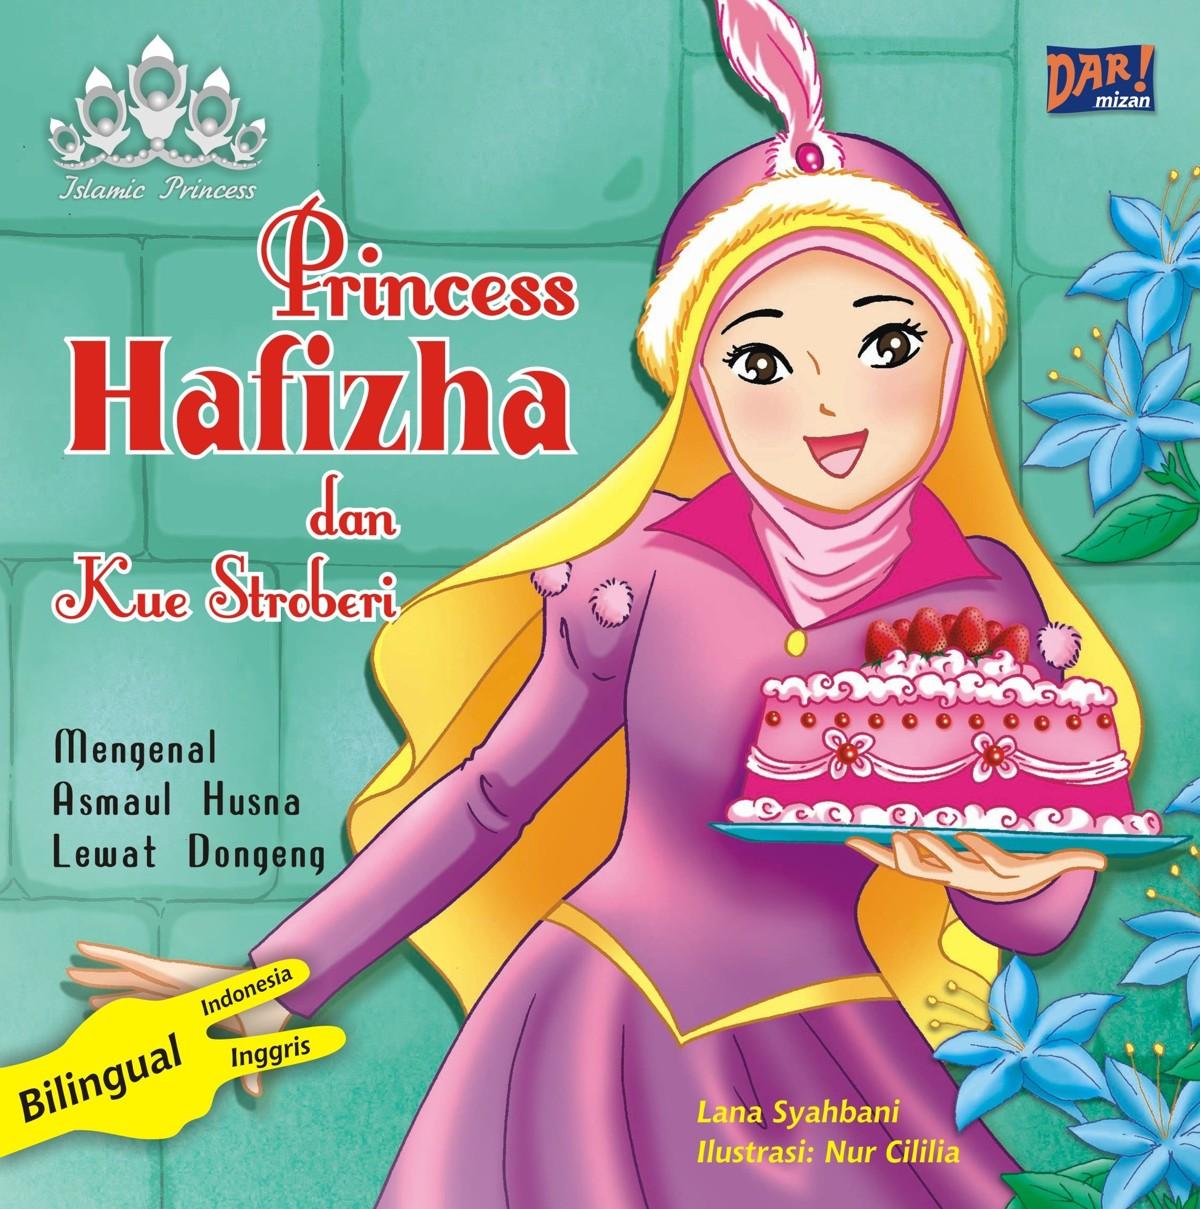 Princess Hafizha dan kue stroberi [sumber elektronis]